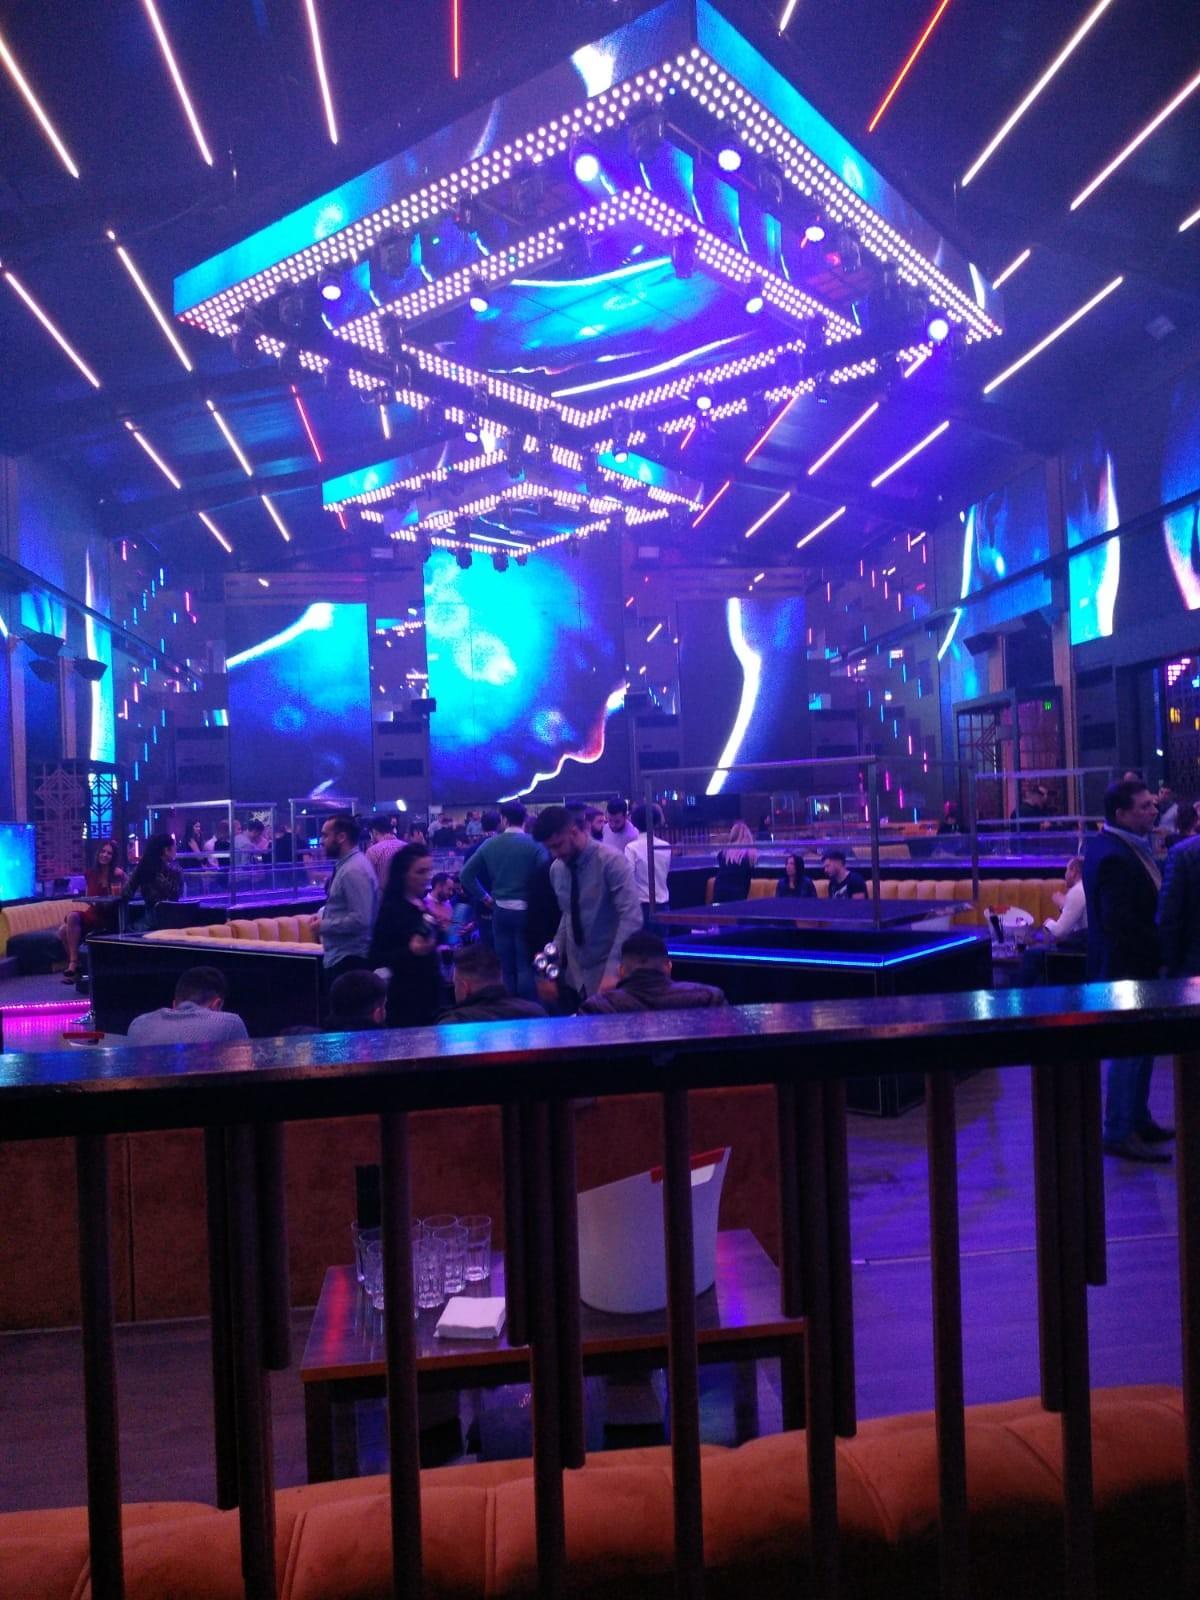 discoteca-bamboo-club-eed887118a11383df3